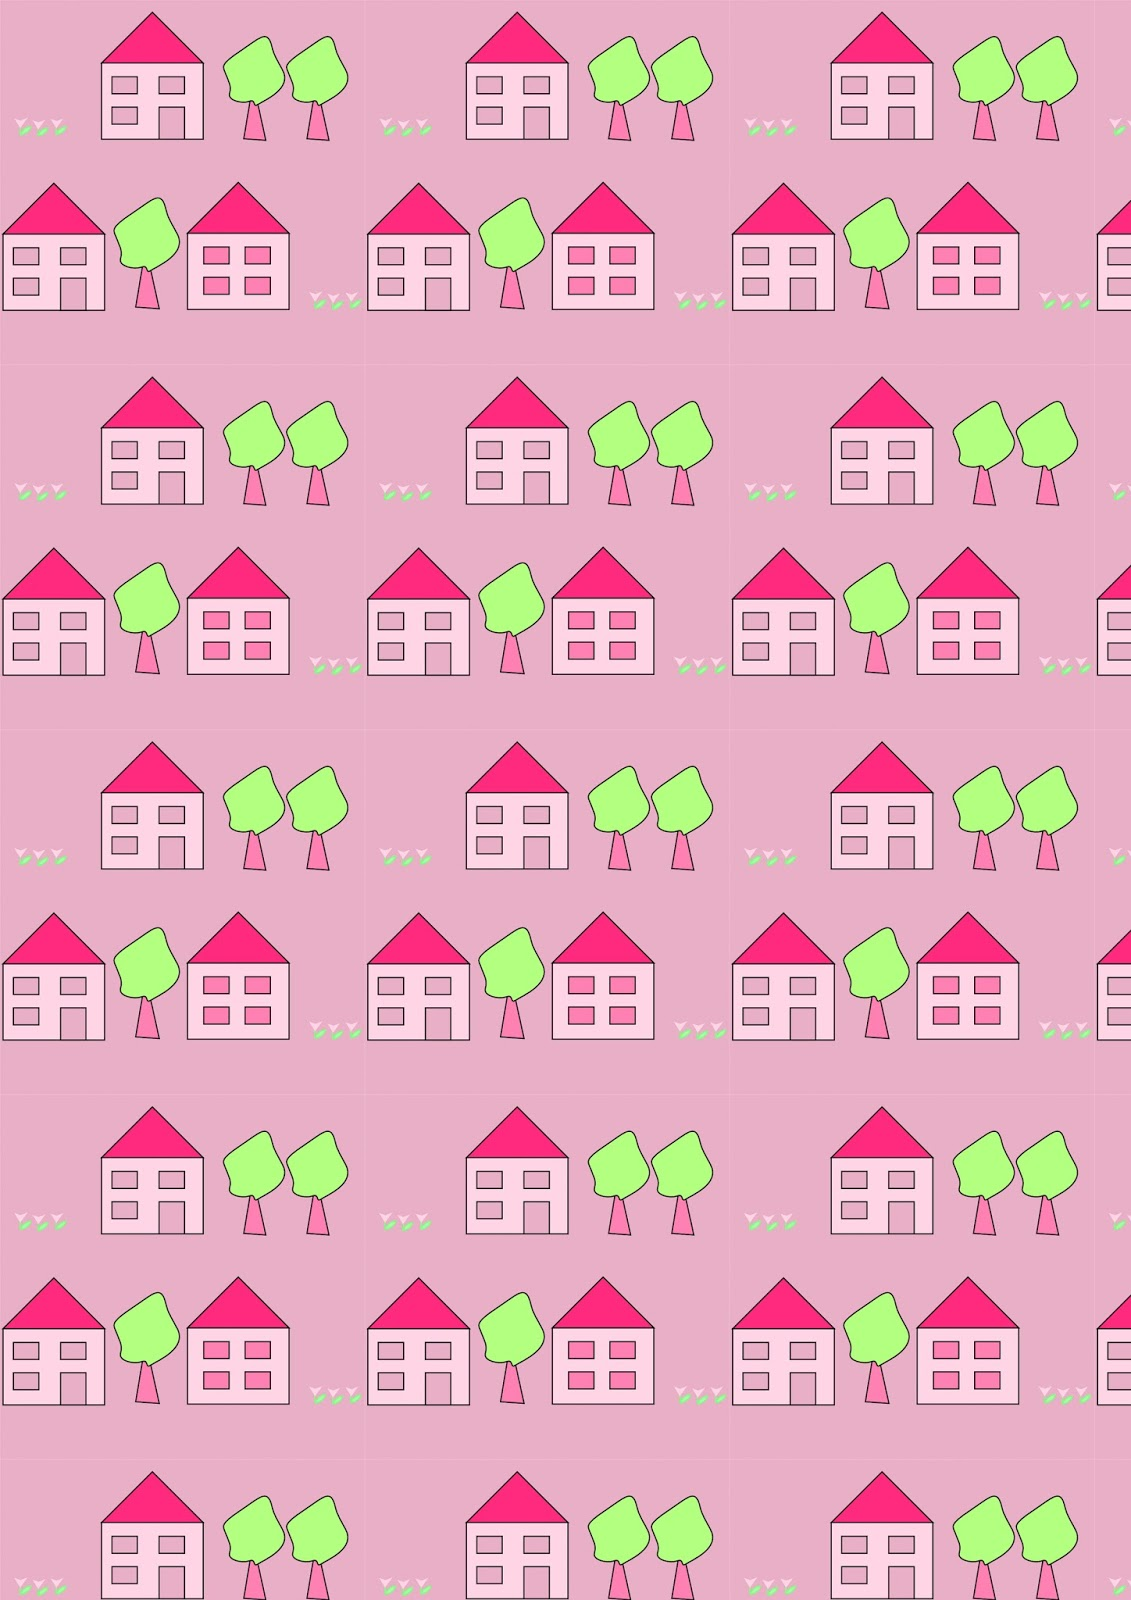 http://2.bp.blogspot.com/-8pL9JmDv-kU/VSwHk7TyY7I/AAAAAAAAikI/KezrPT62PBY/s1600/house_pattern_paper_A4.jpg